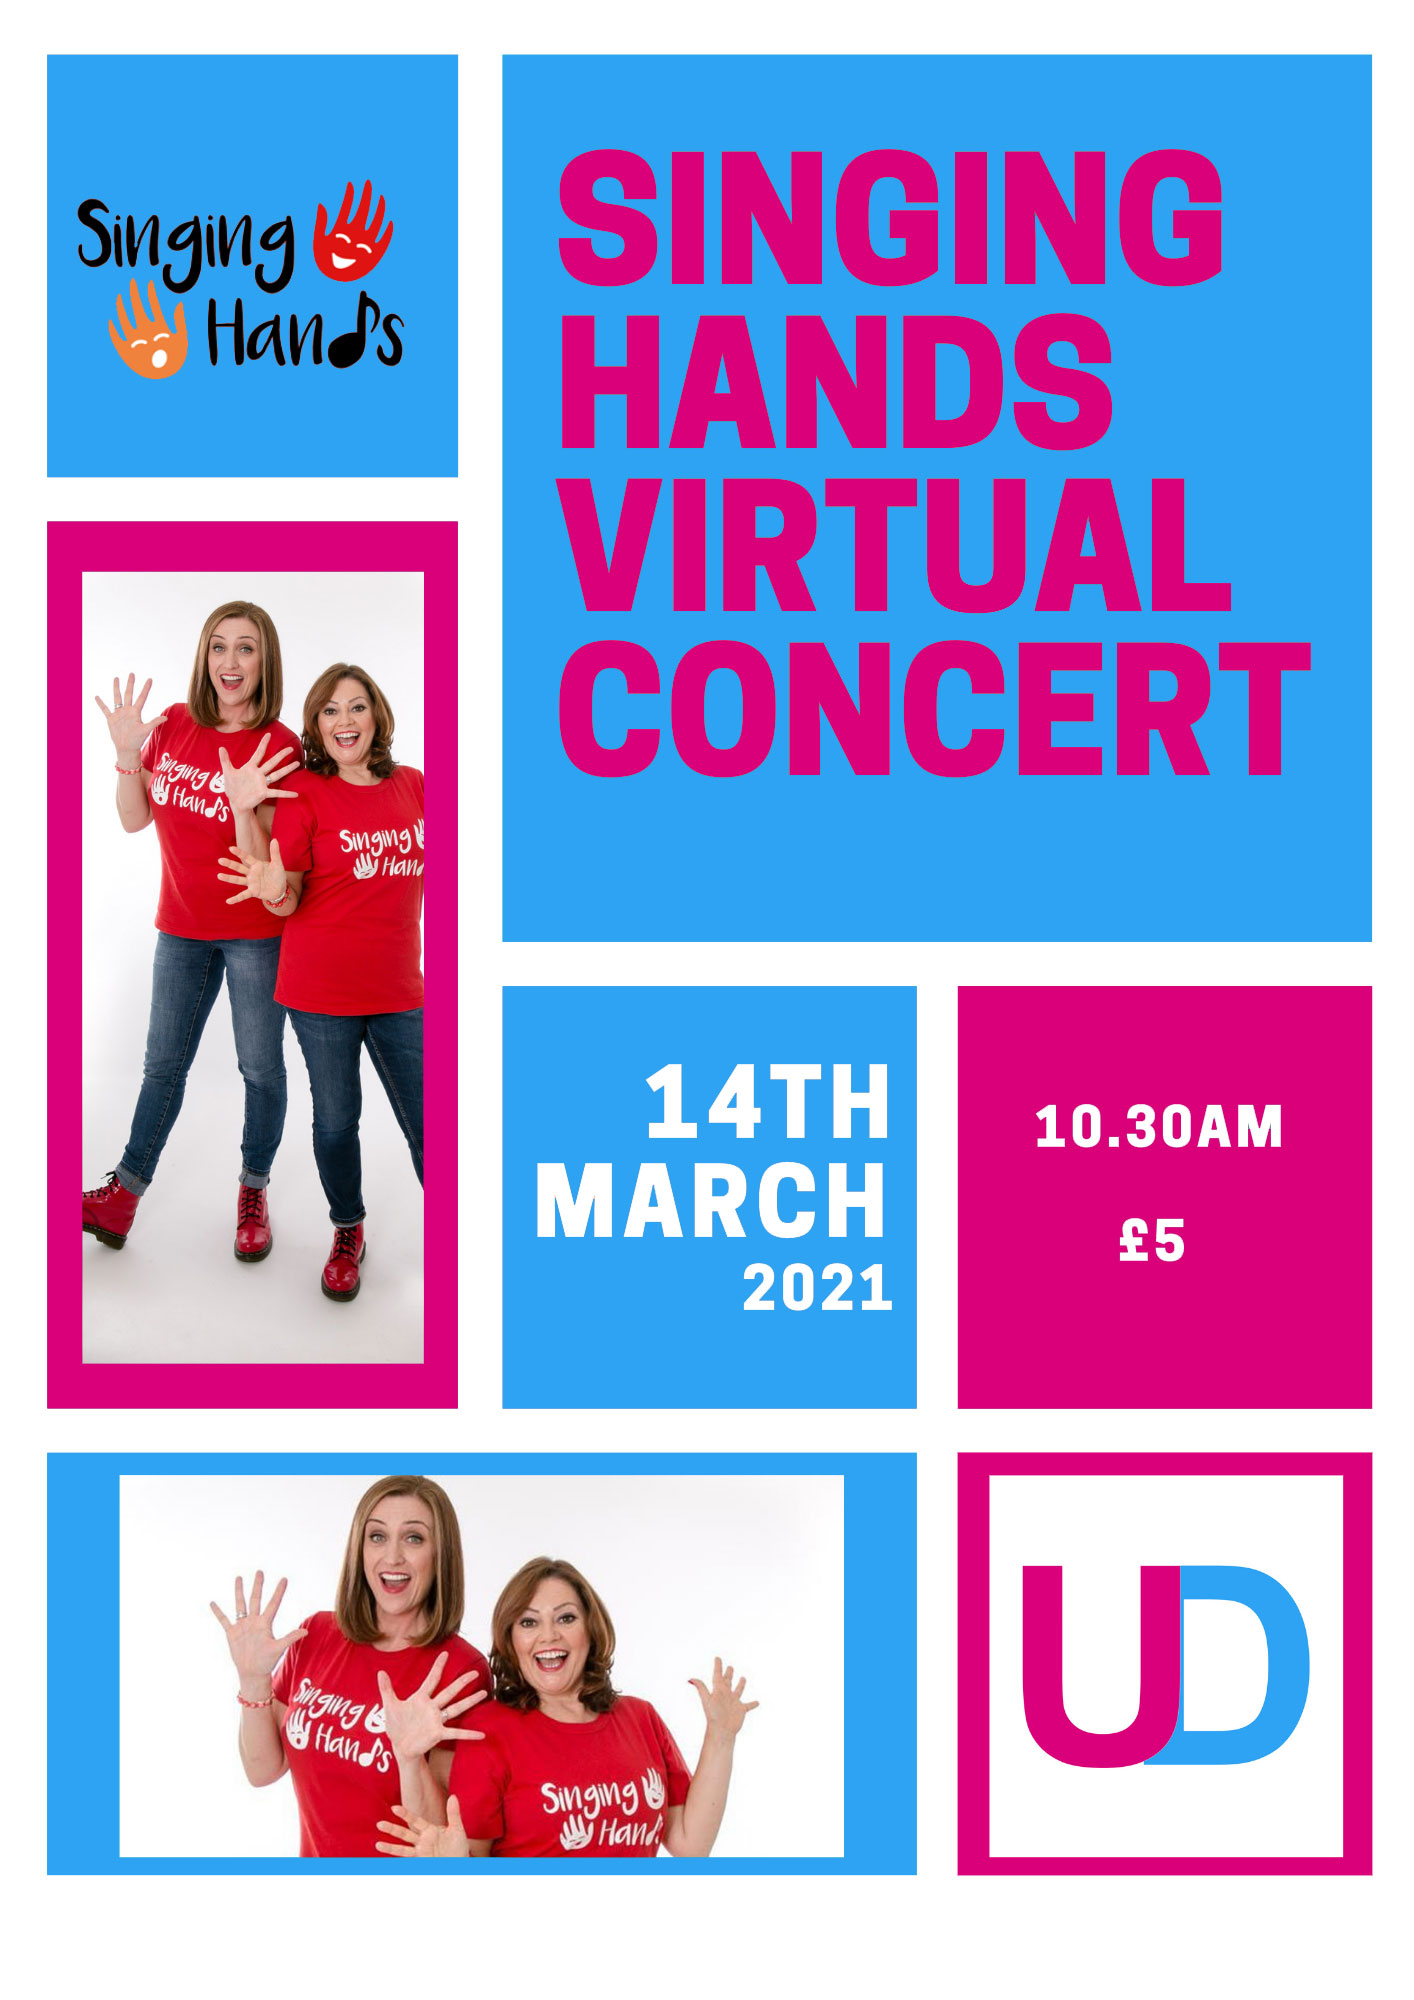 Singing Hands Virtual Concert Poster